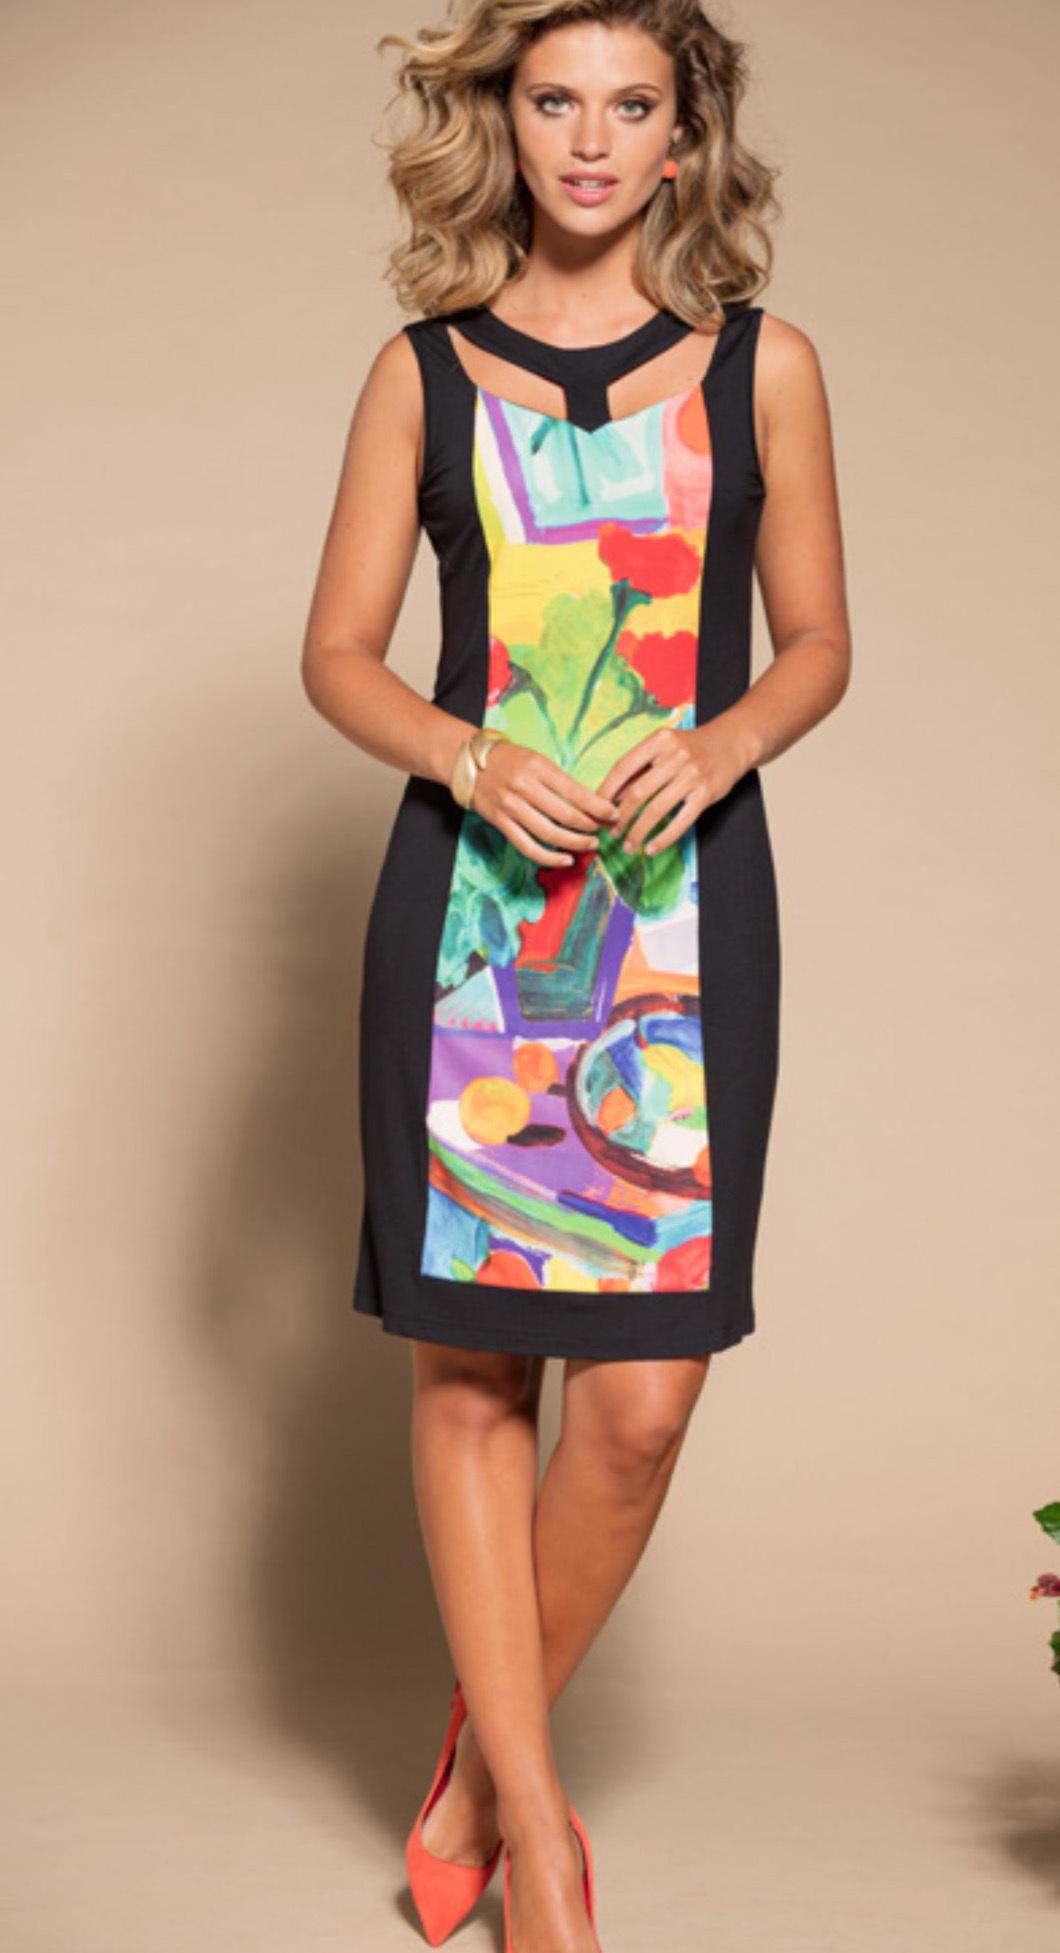 Maloka: Apples & Cherries Color Contrast Midi Dress (More Art Patterns!) MK_FLORENCE_N